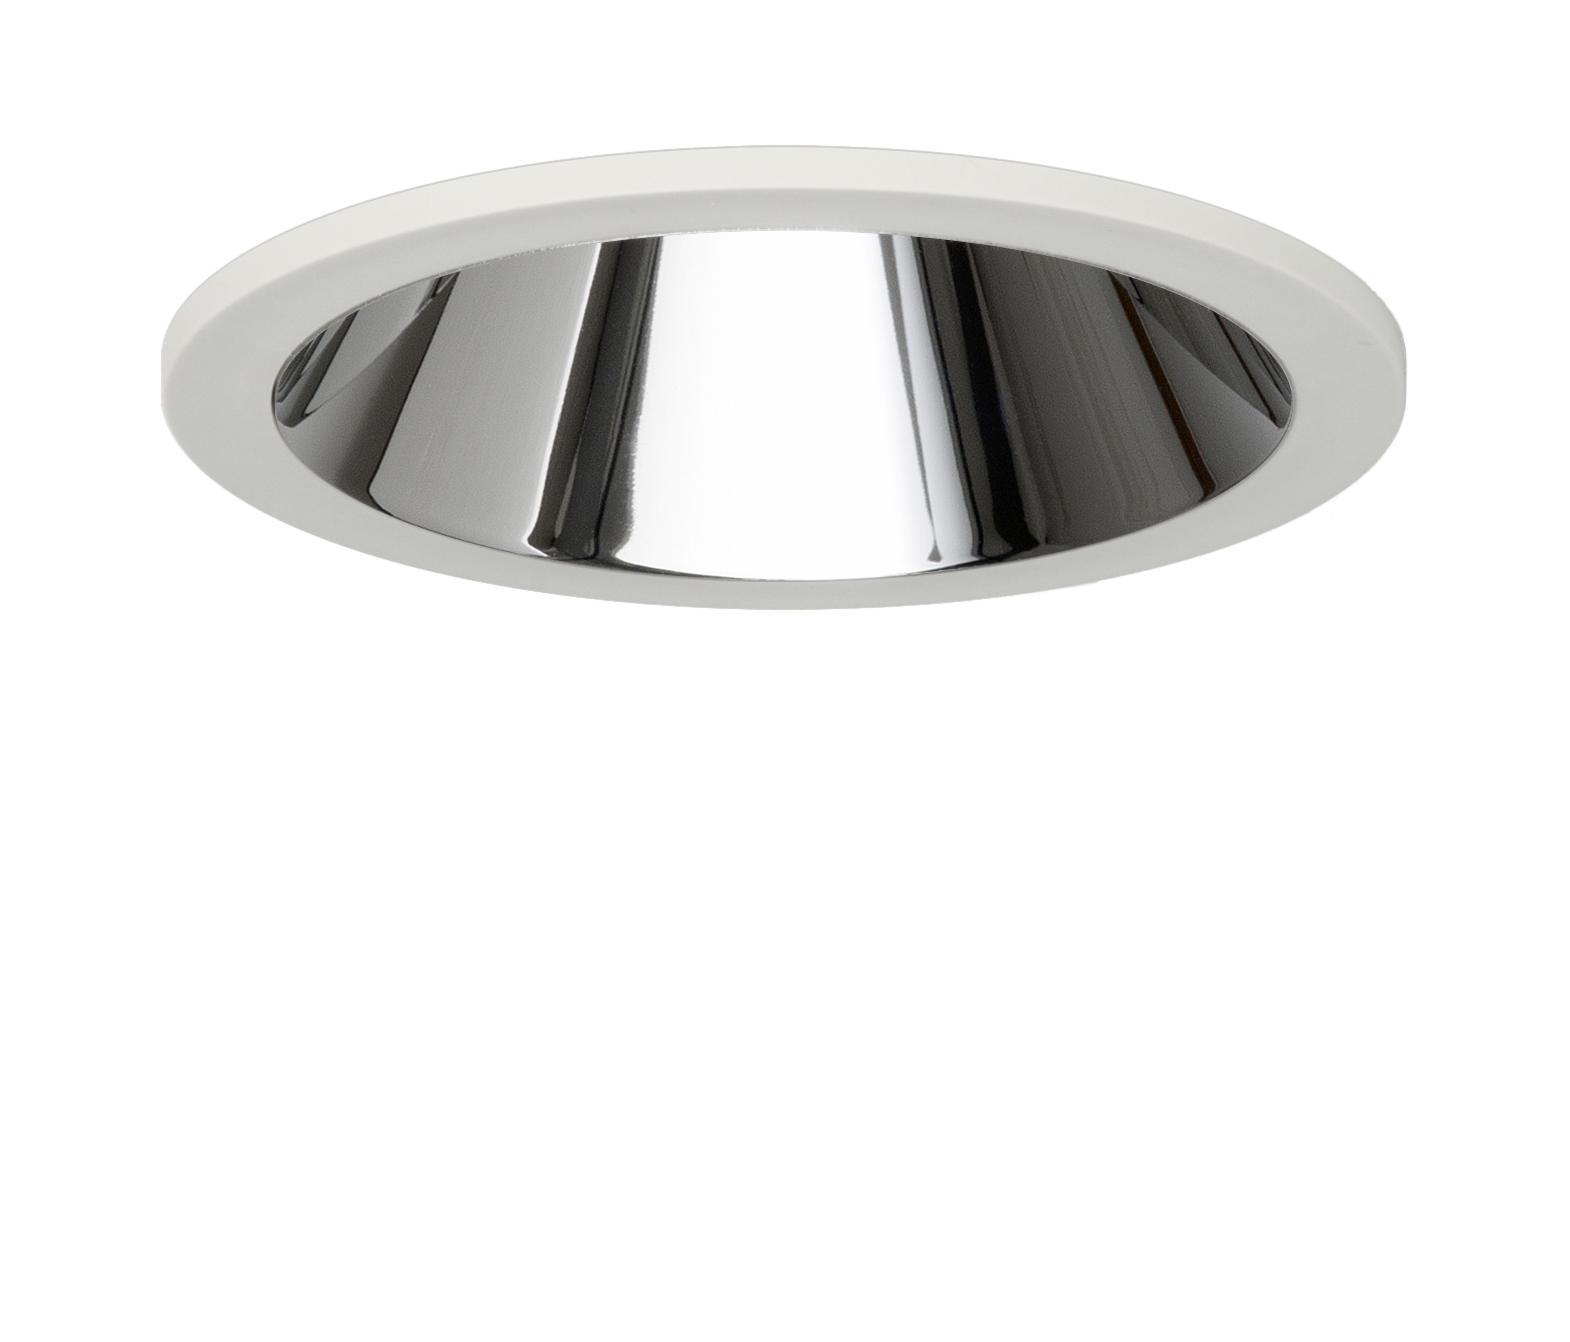 tritec recessed luminaire round downlight general. Black Bedroom Furniture Sets. Home Design Ideas